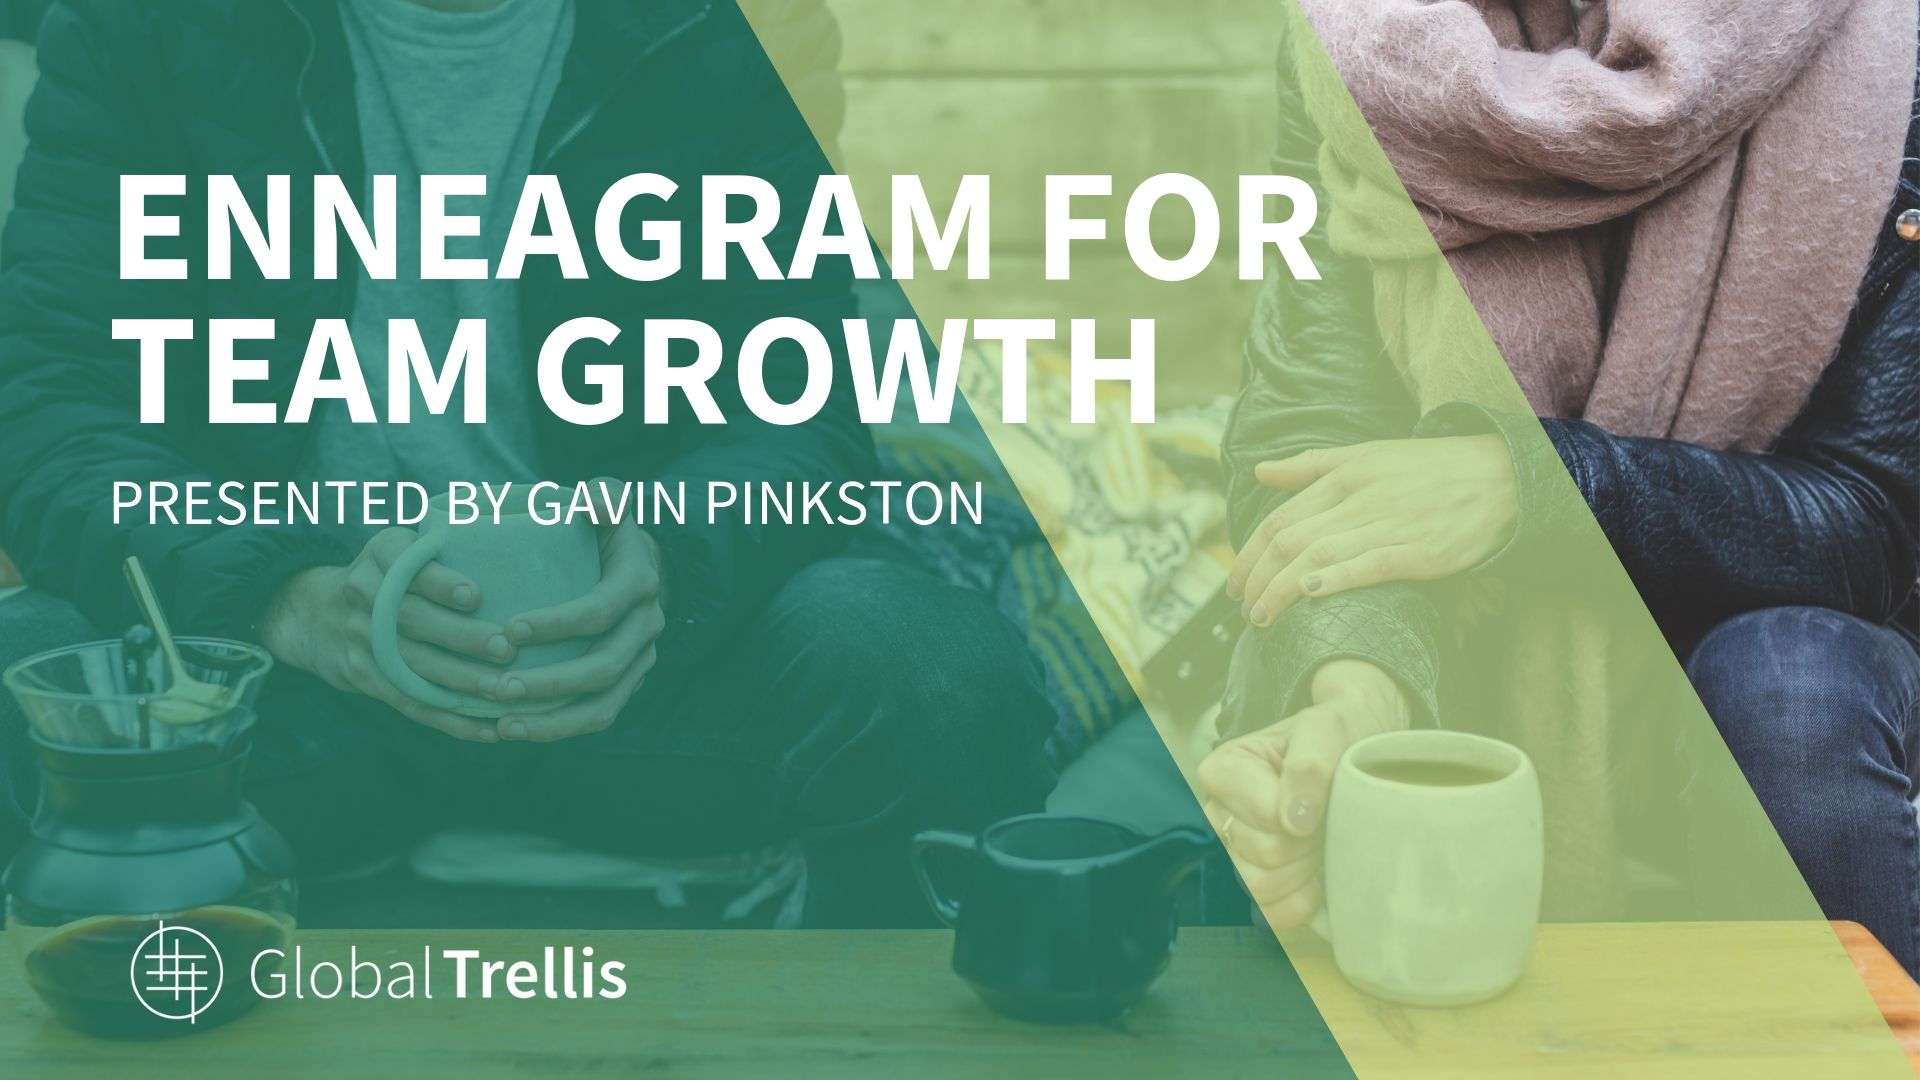 Enneagram For Team Growth